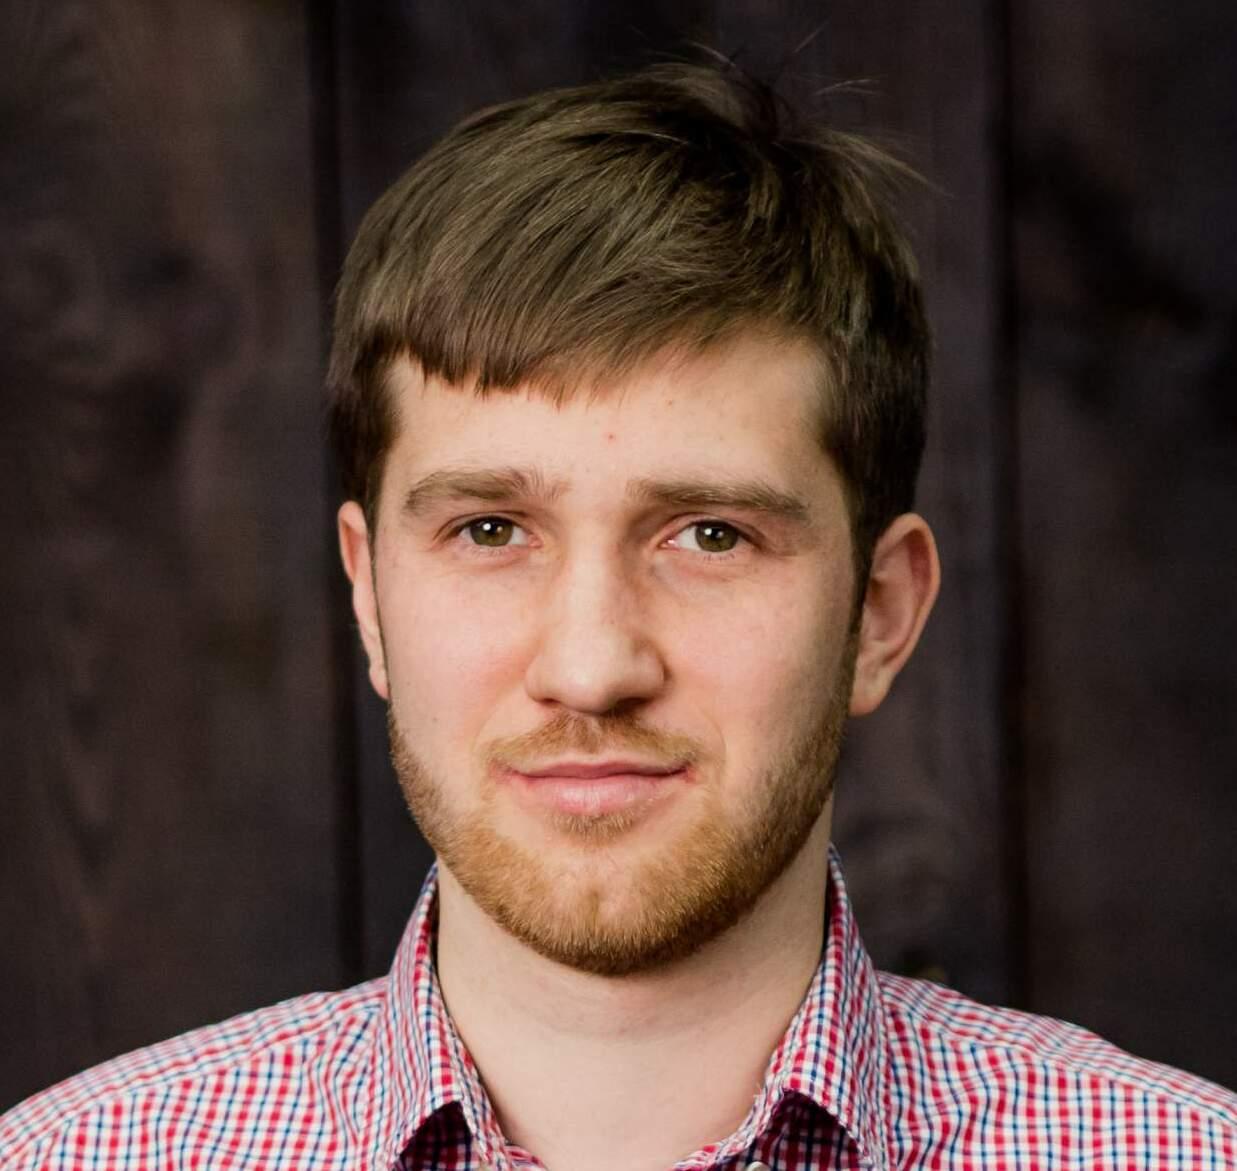 Yehor Maiorov